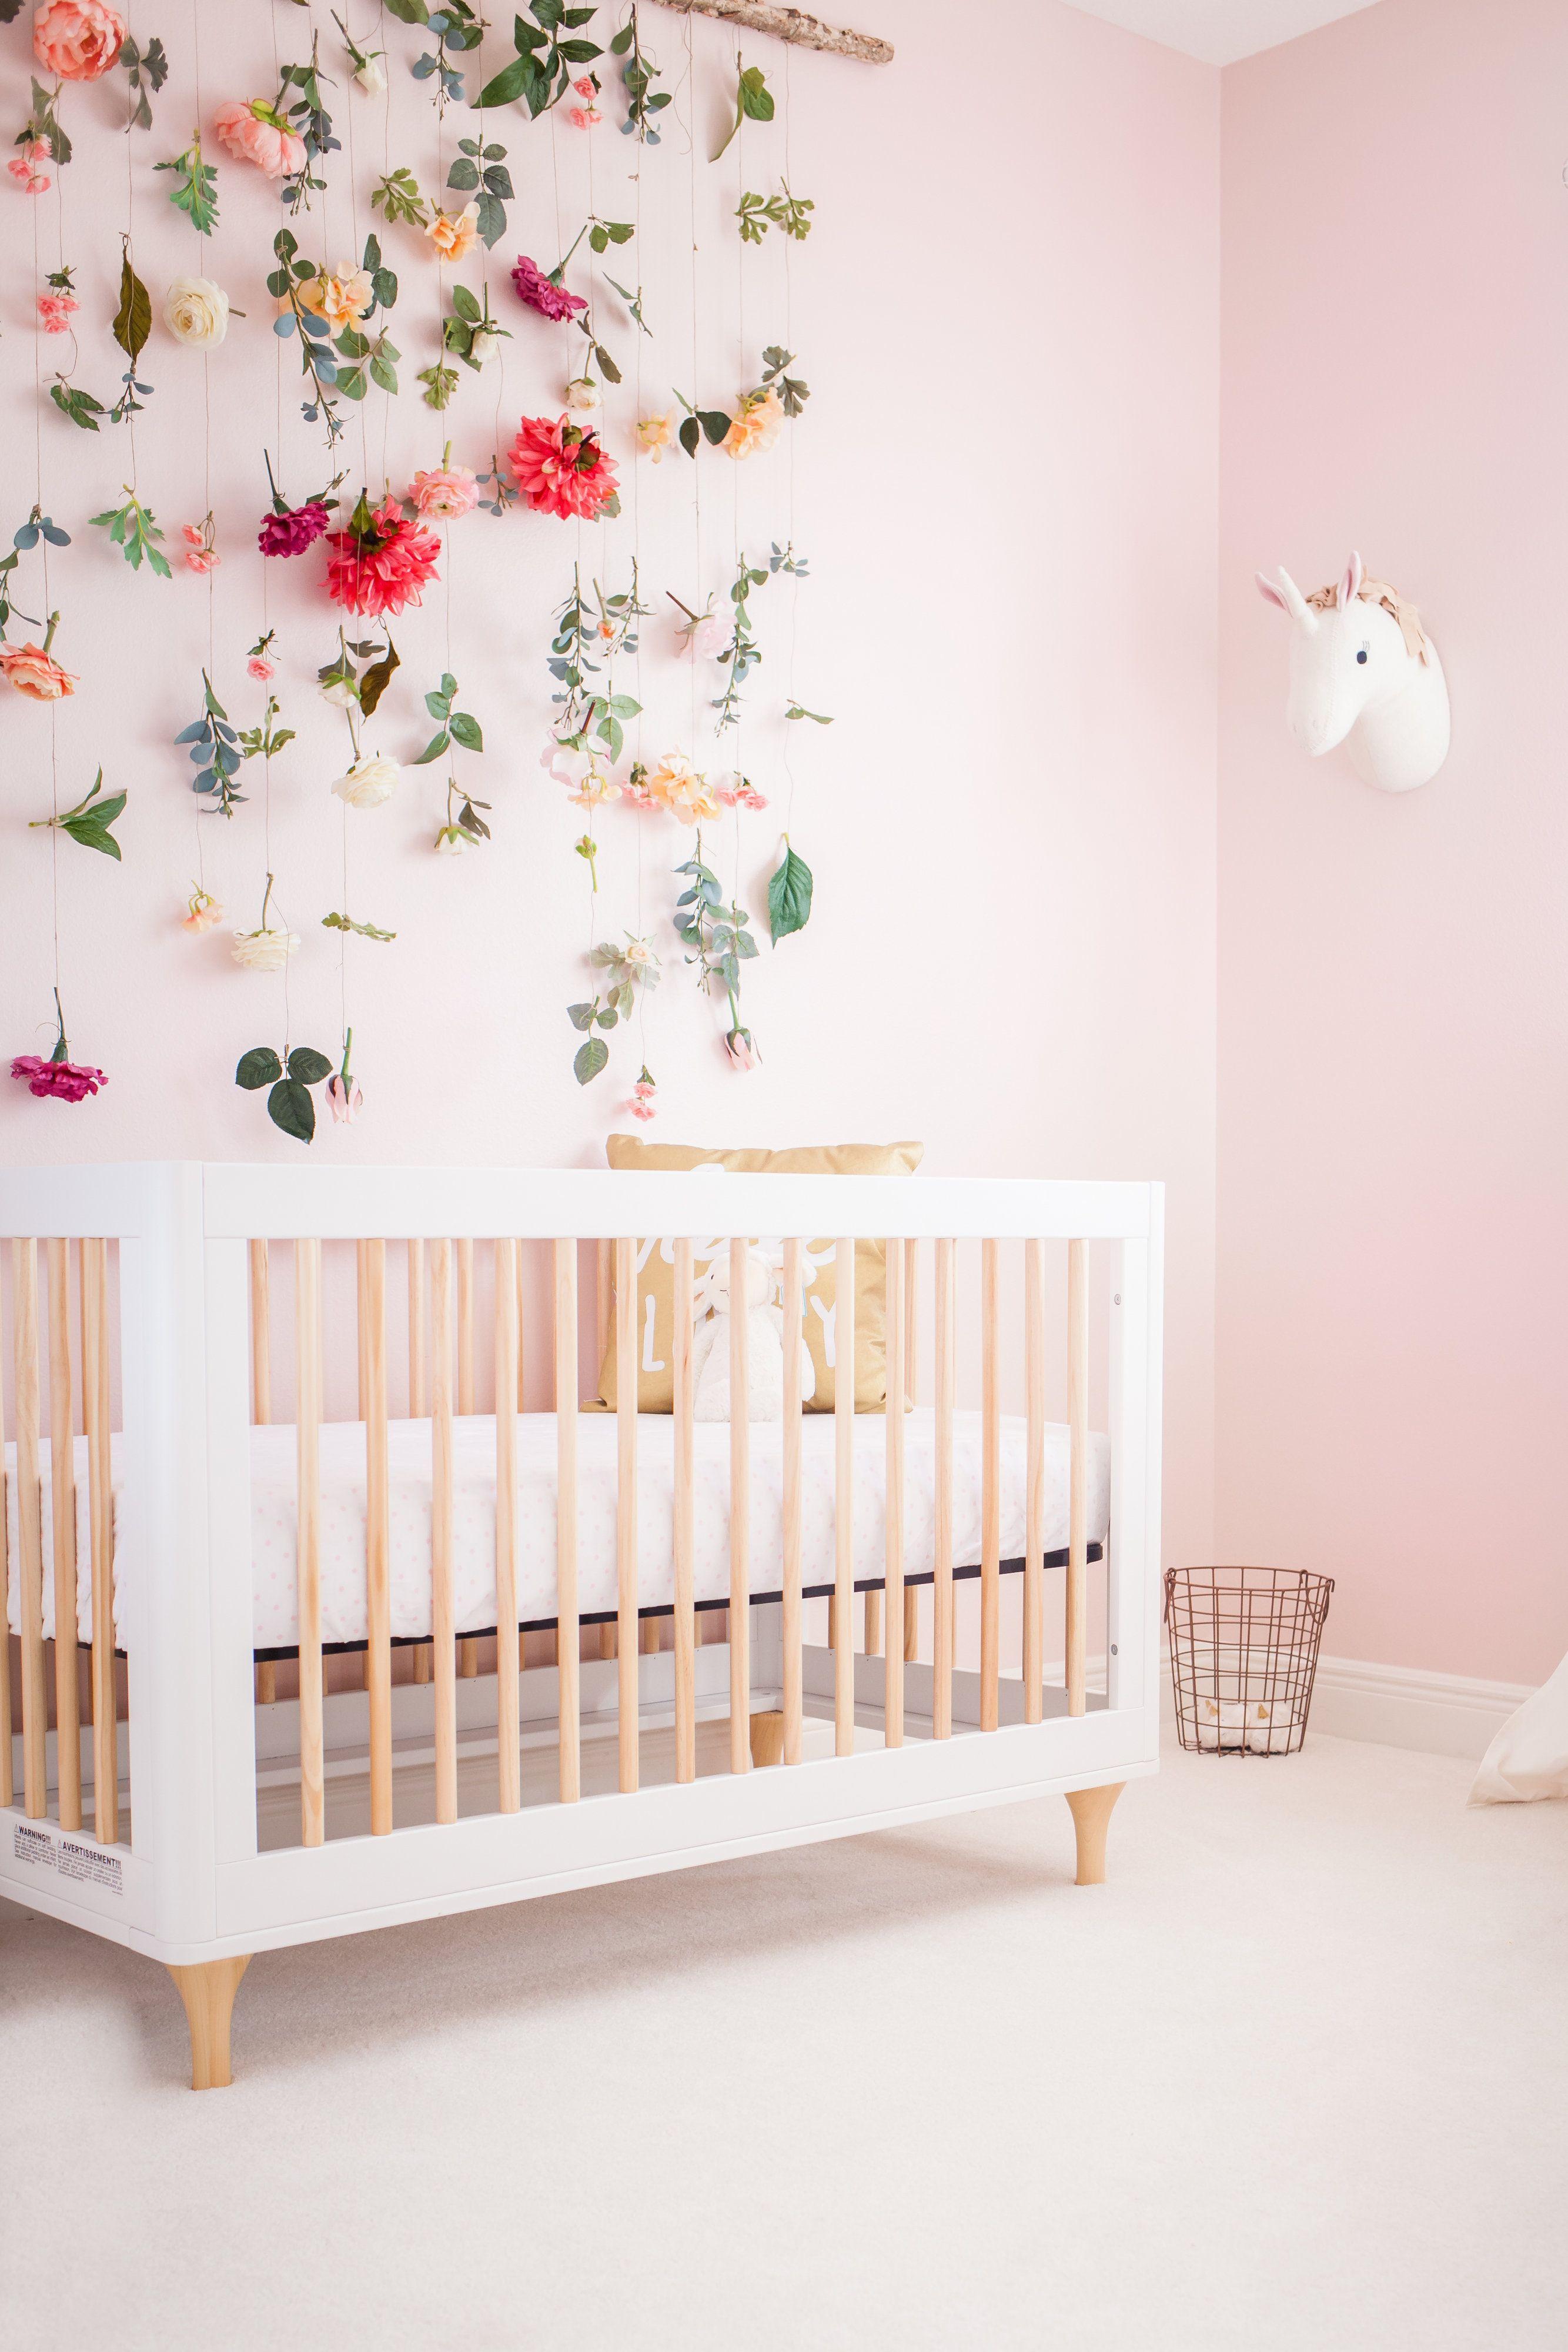 Blush Nursery Decor With Images Kid